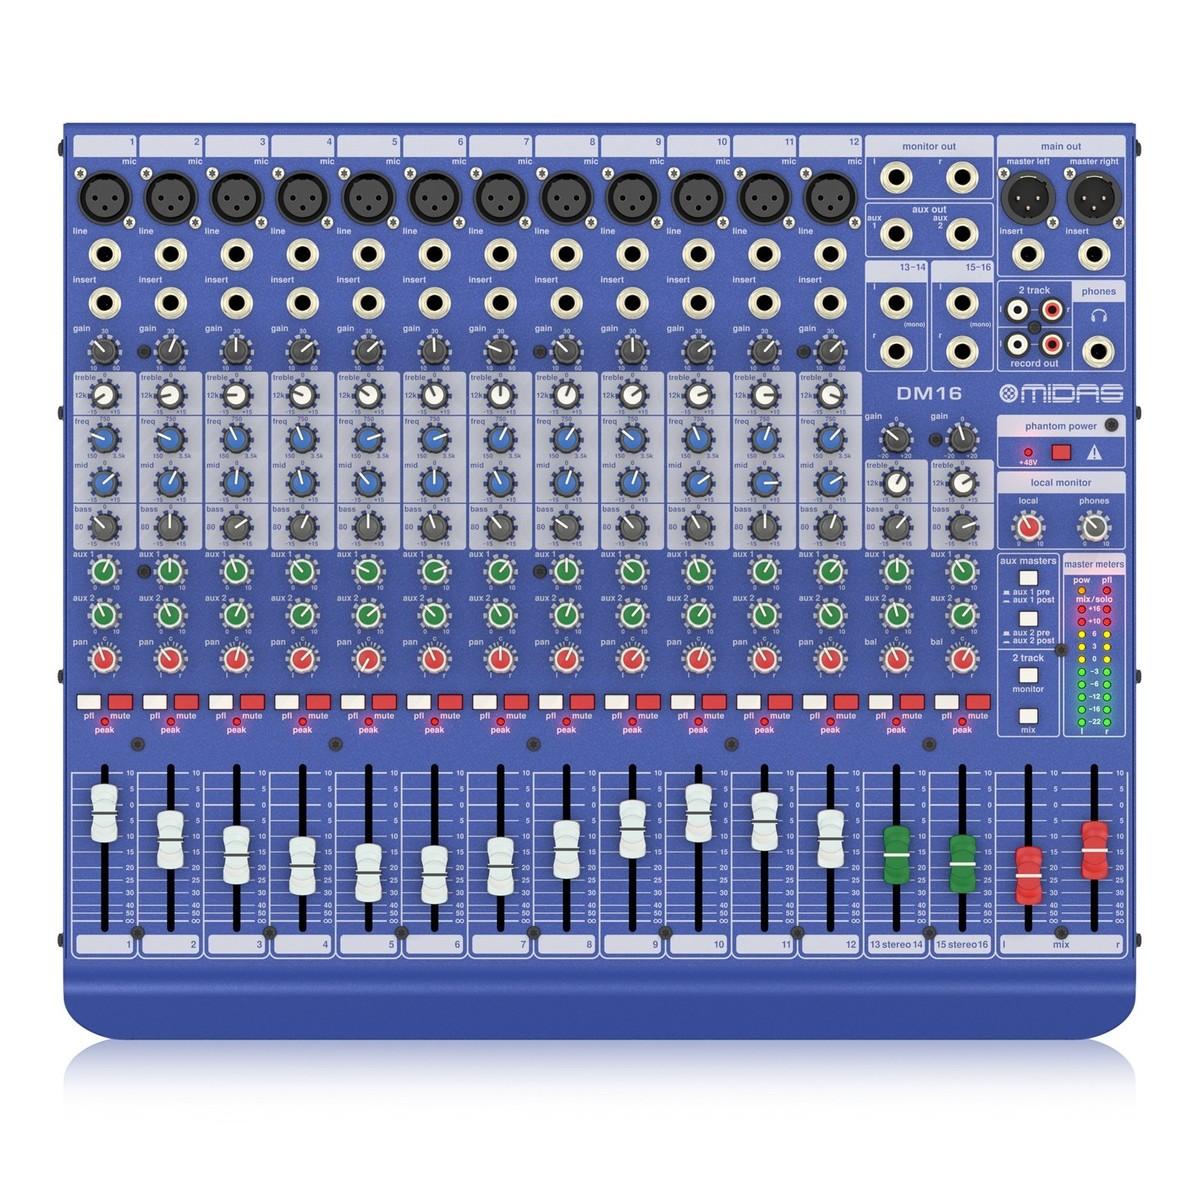 Midas DM16 Analogue Mixer at Gear4music